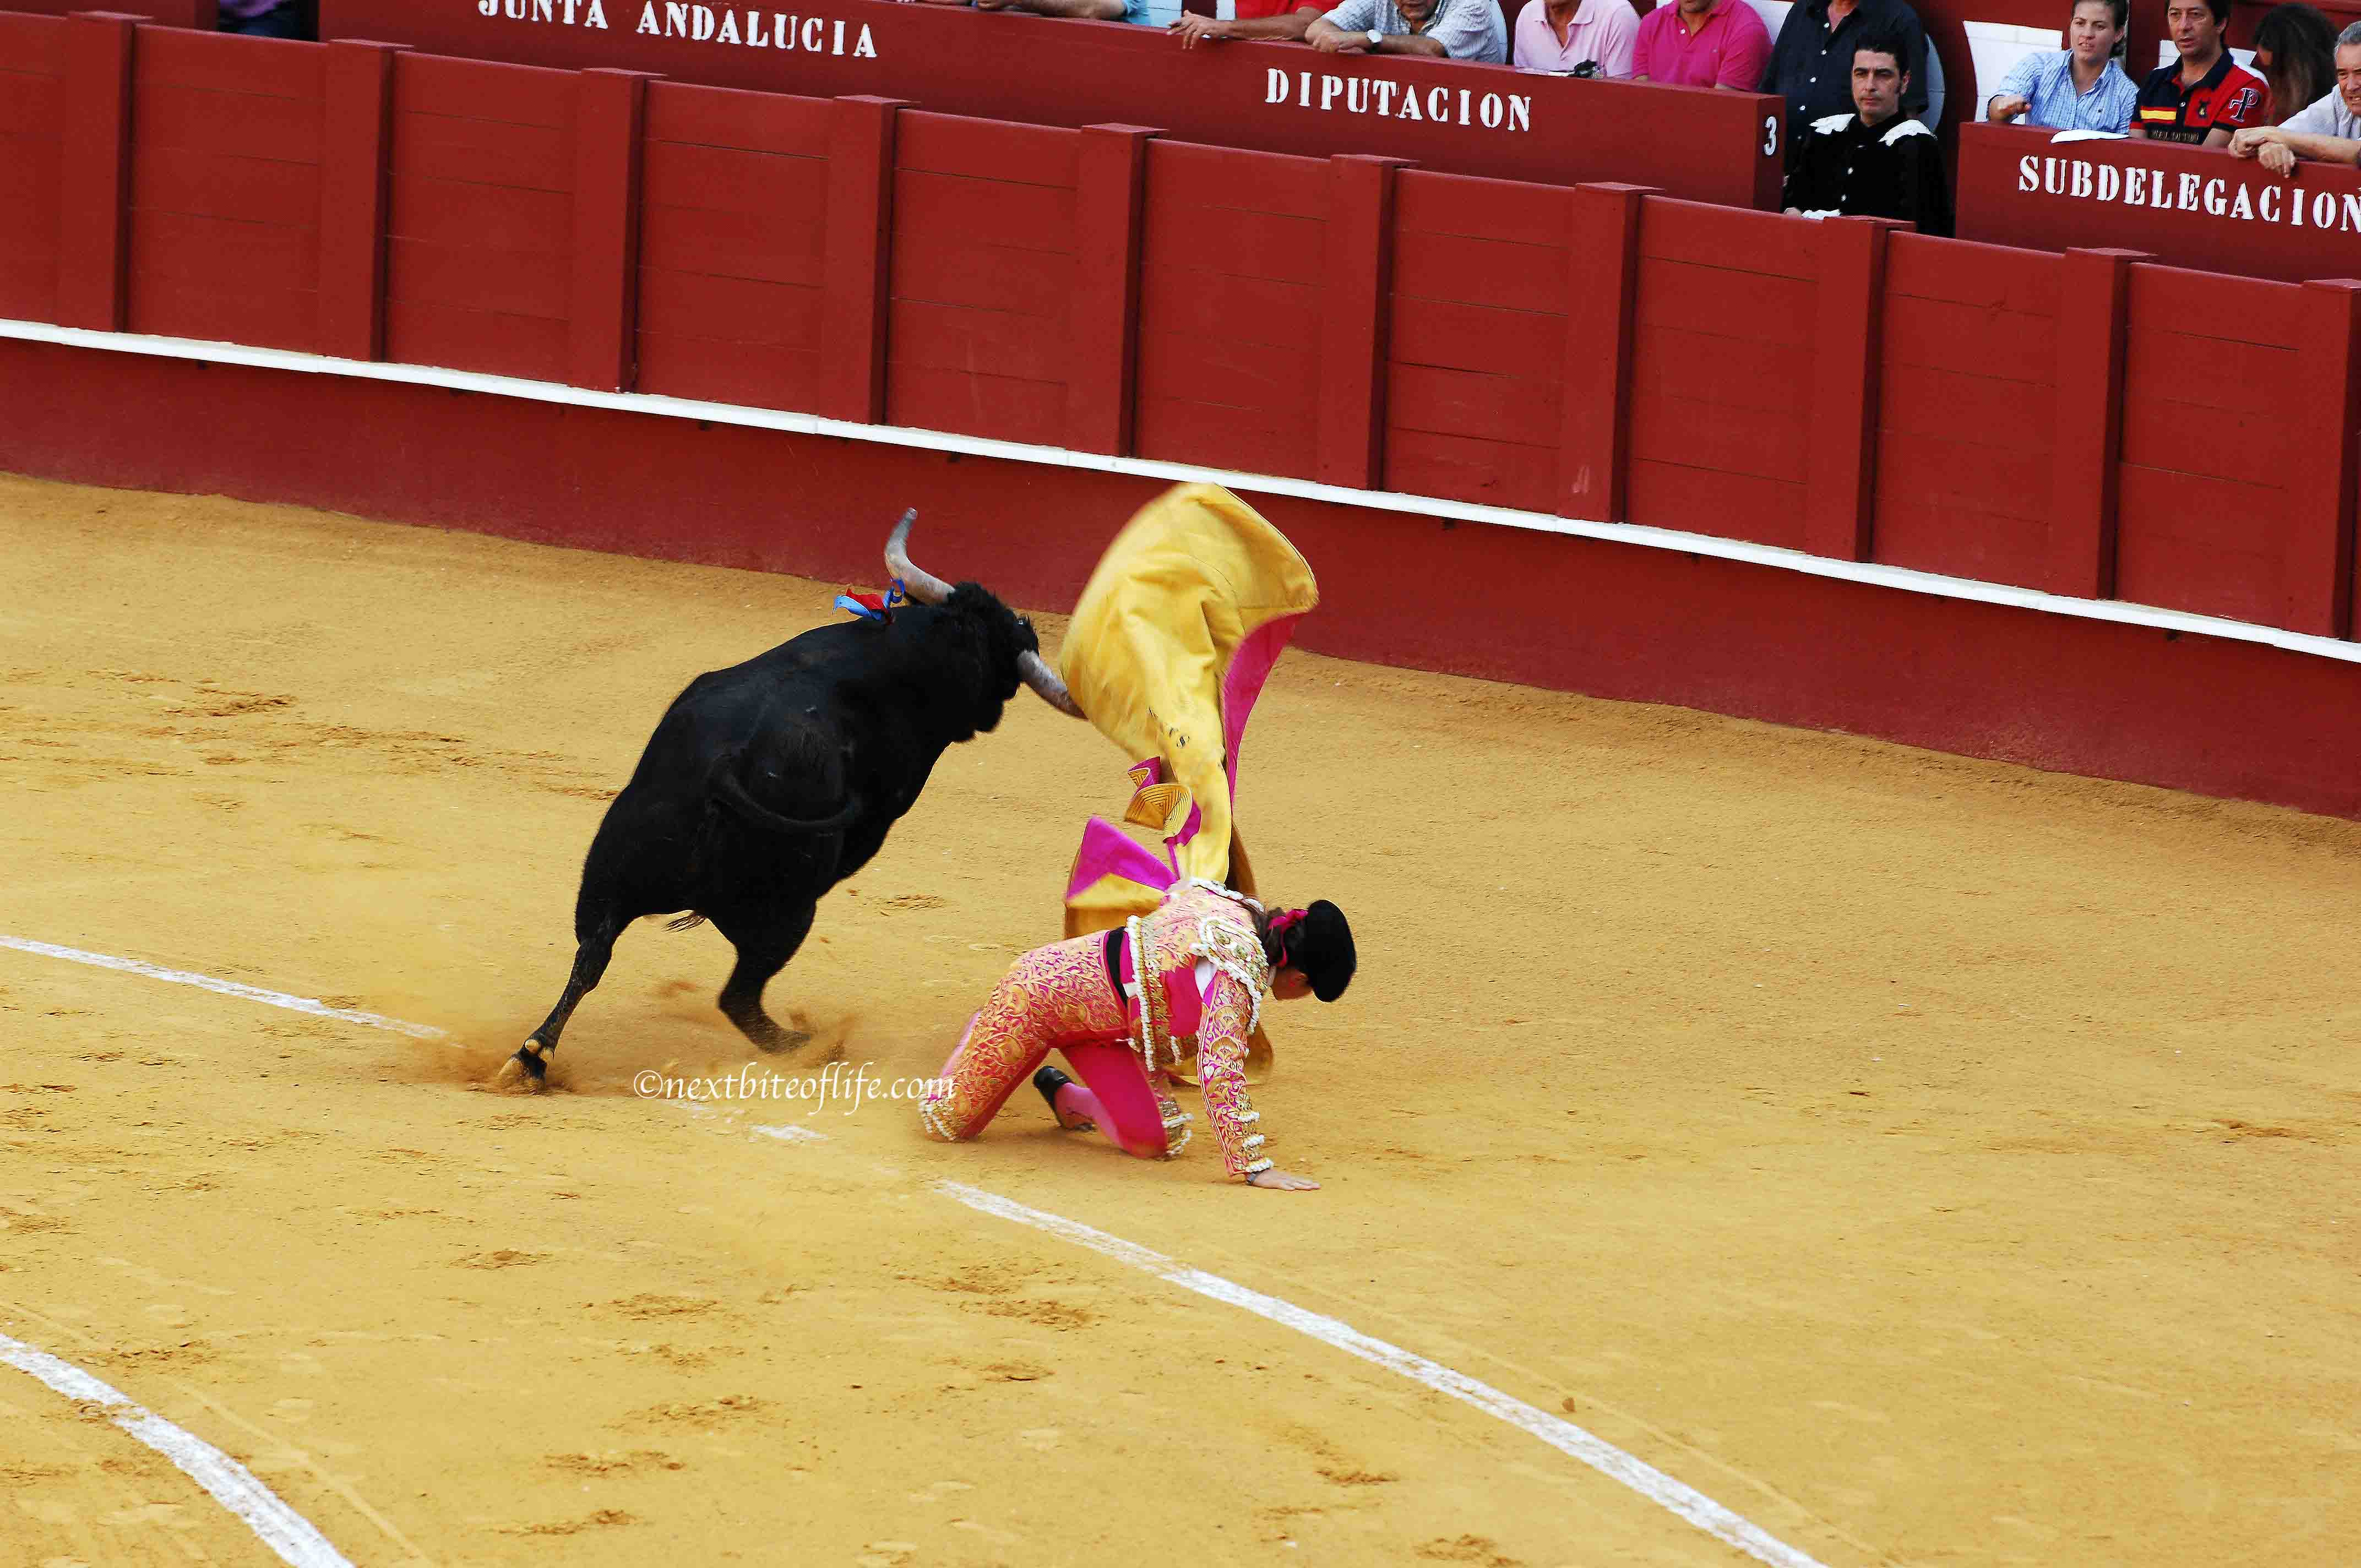 Matador versus Bull, the Corrida ( Bullfighting Sucks! )